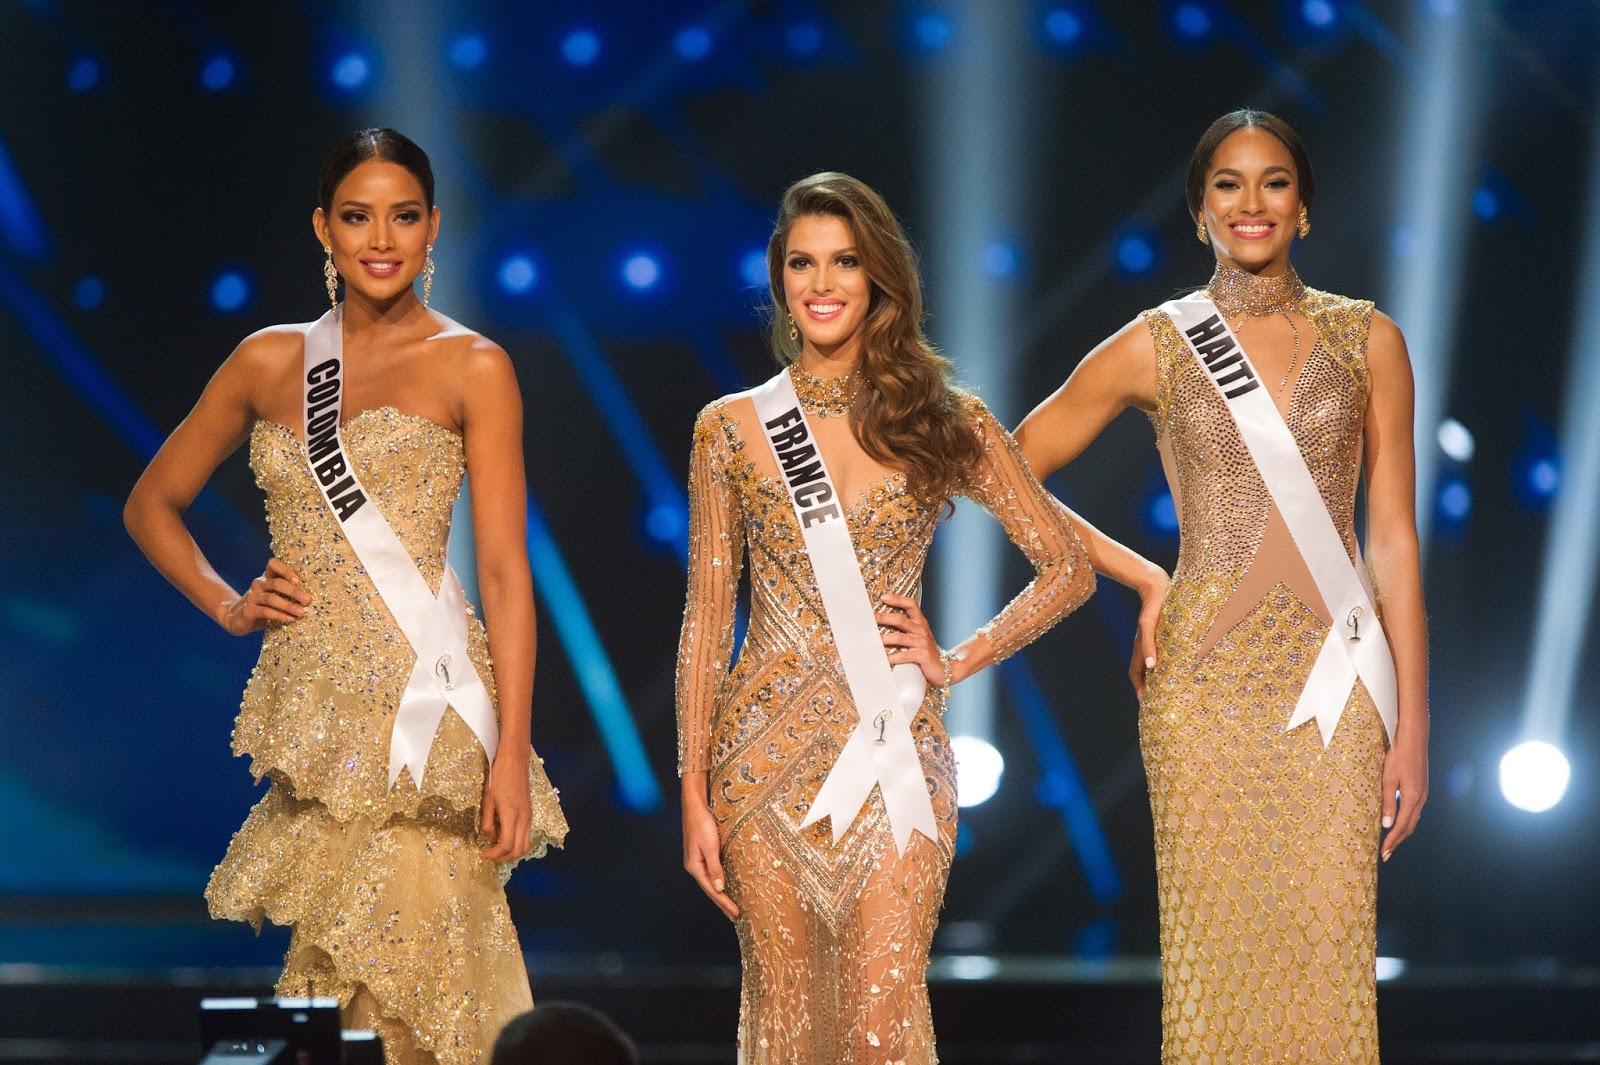 Miss Universo 2017 Colombia >> 100% BJ : Miss França vence o concurso Miss Universo 2017